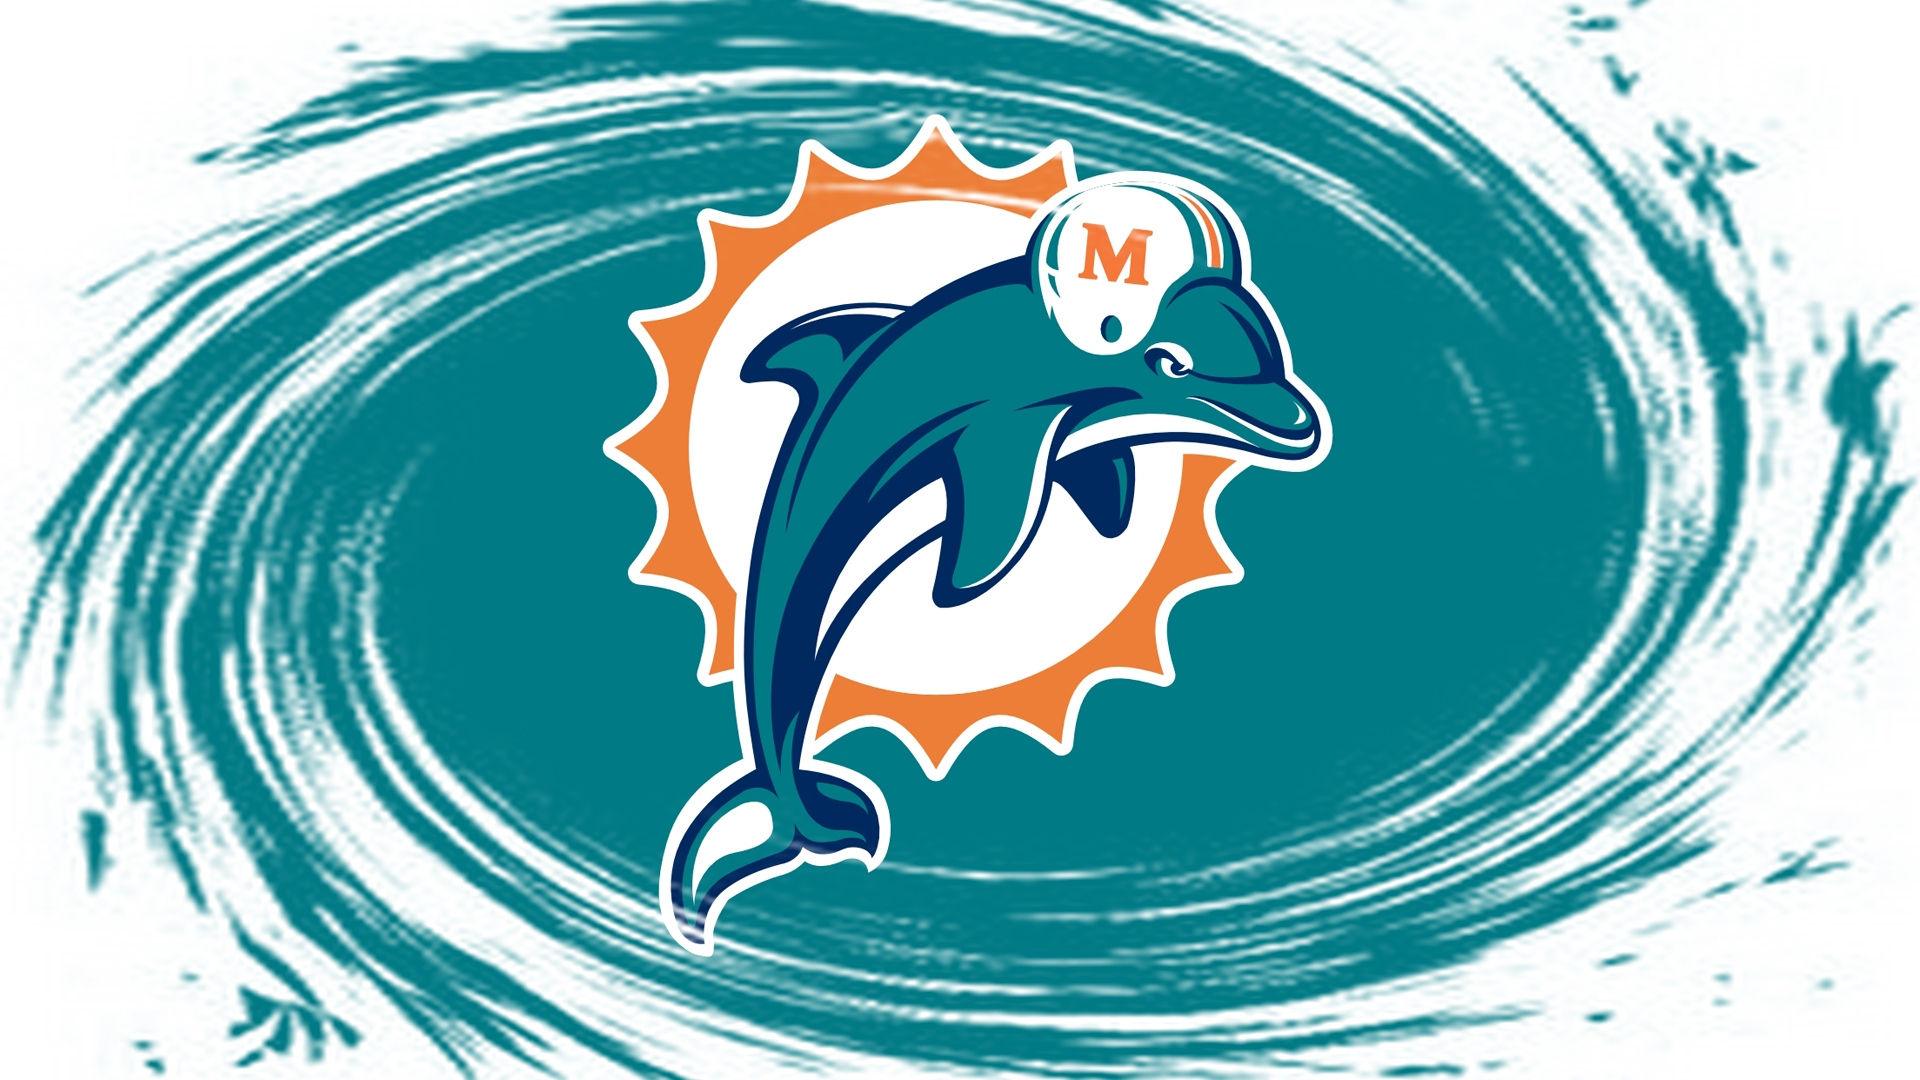 NFL Miami Dolphins Logo Whirlpool 1920x1080 HD NFL Miami Dolphins 1920x1080